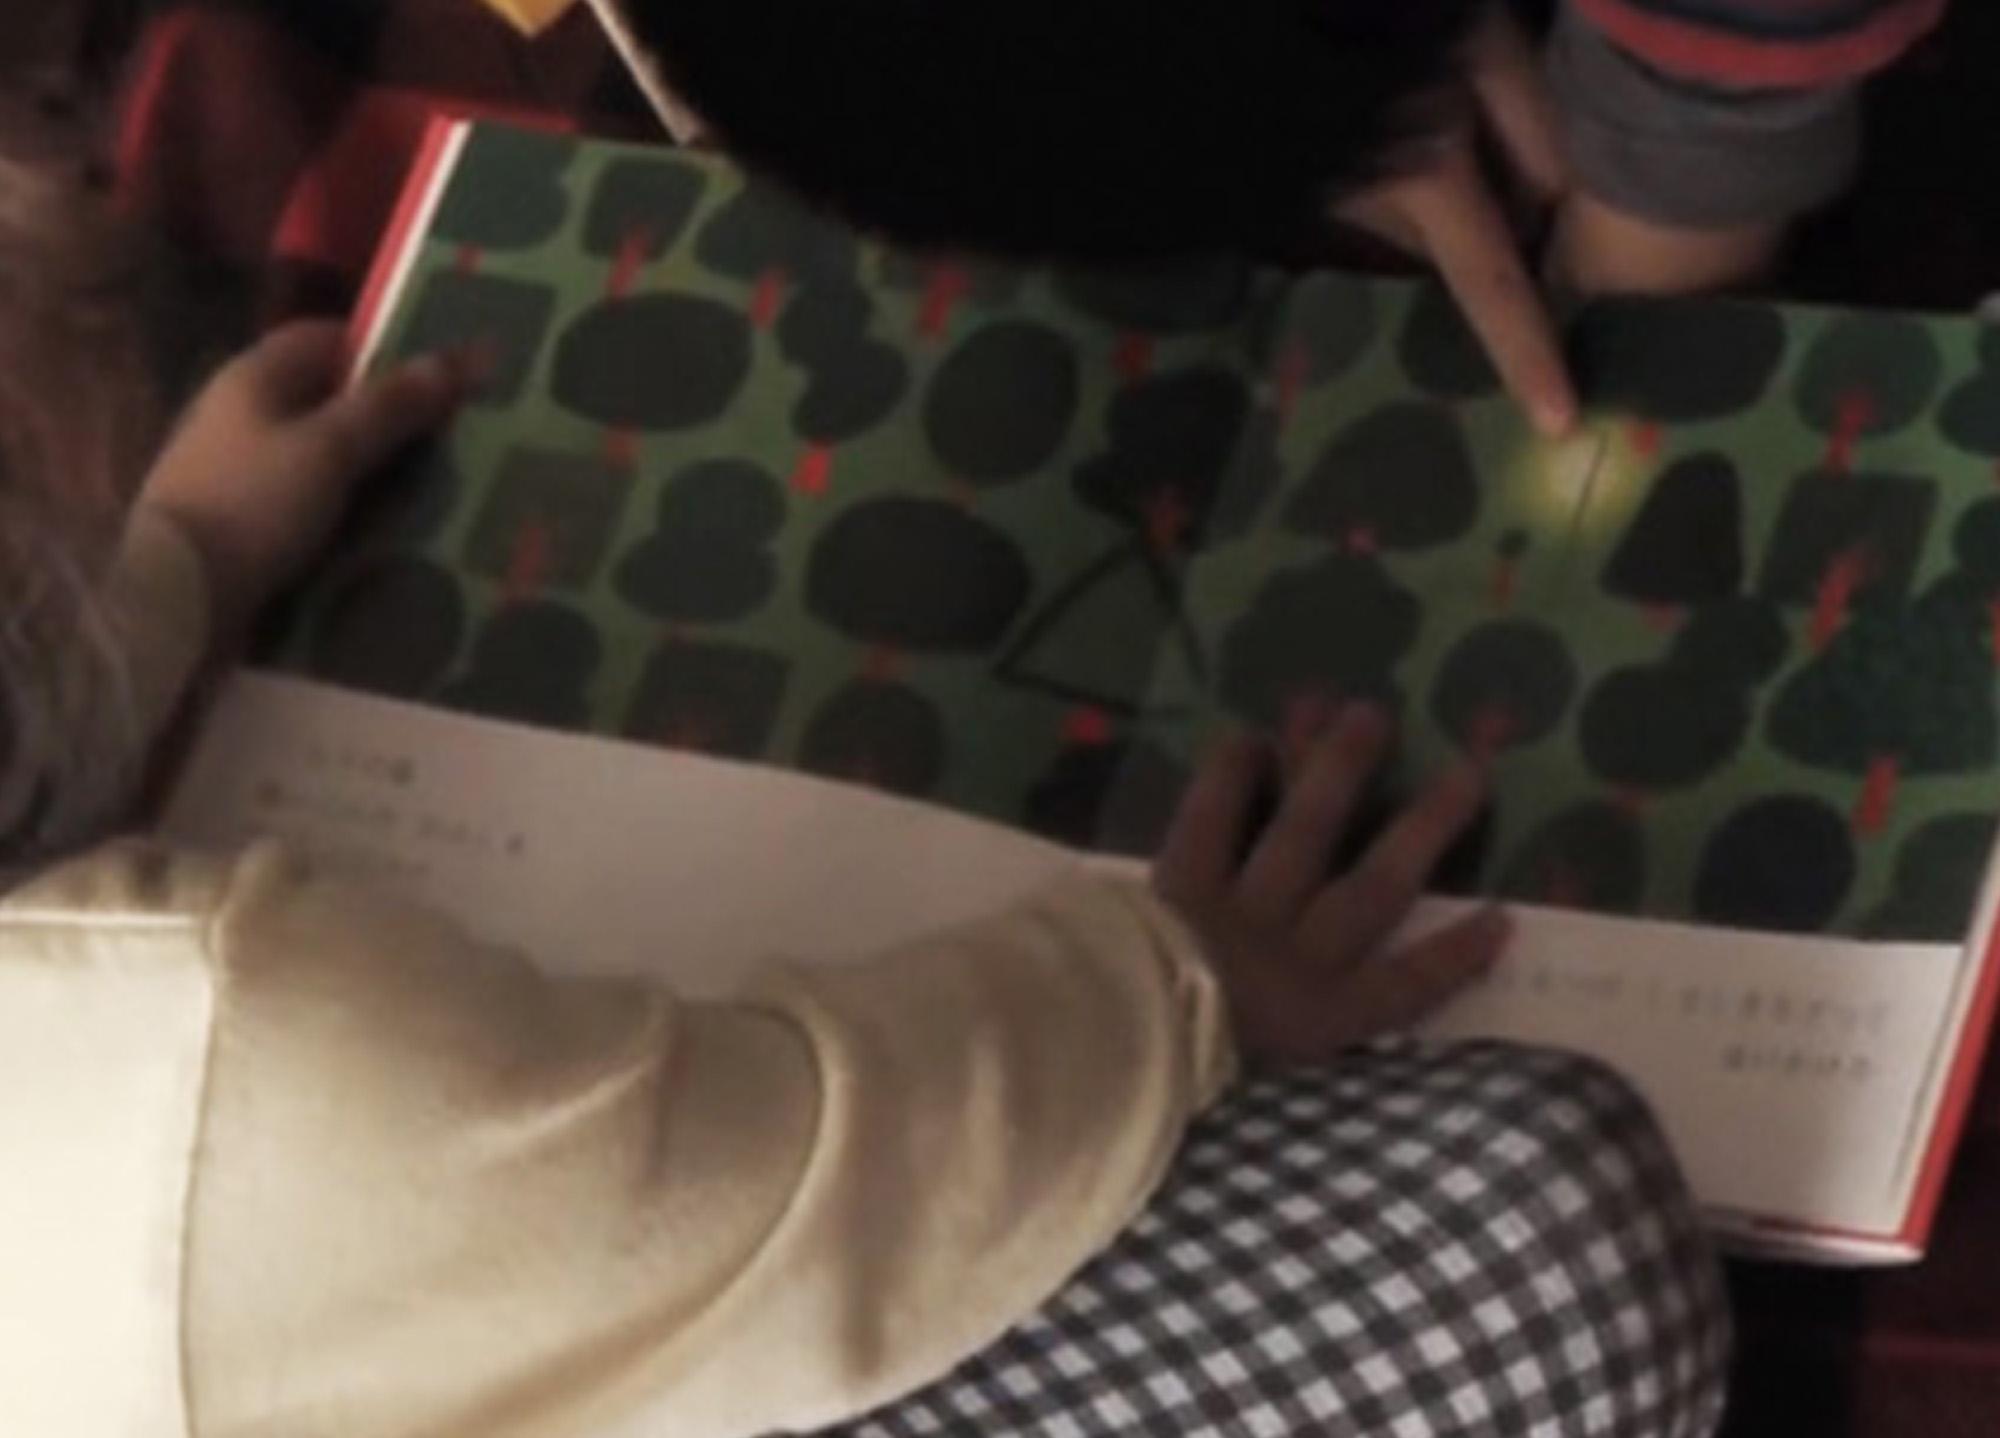 harmonic hammock / つもりの森 【MV】